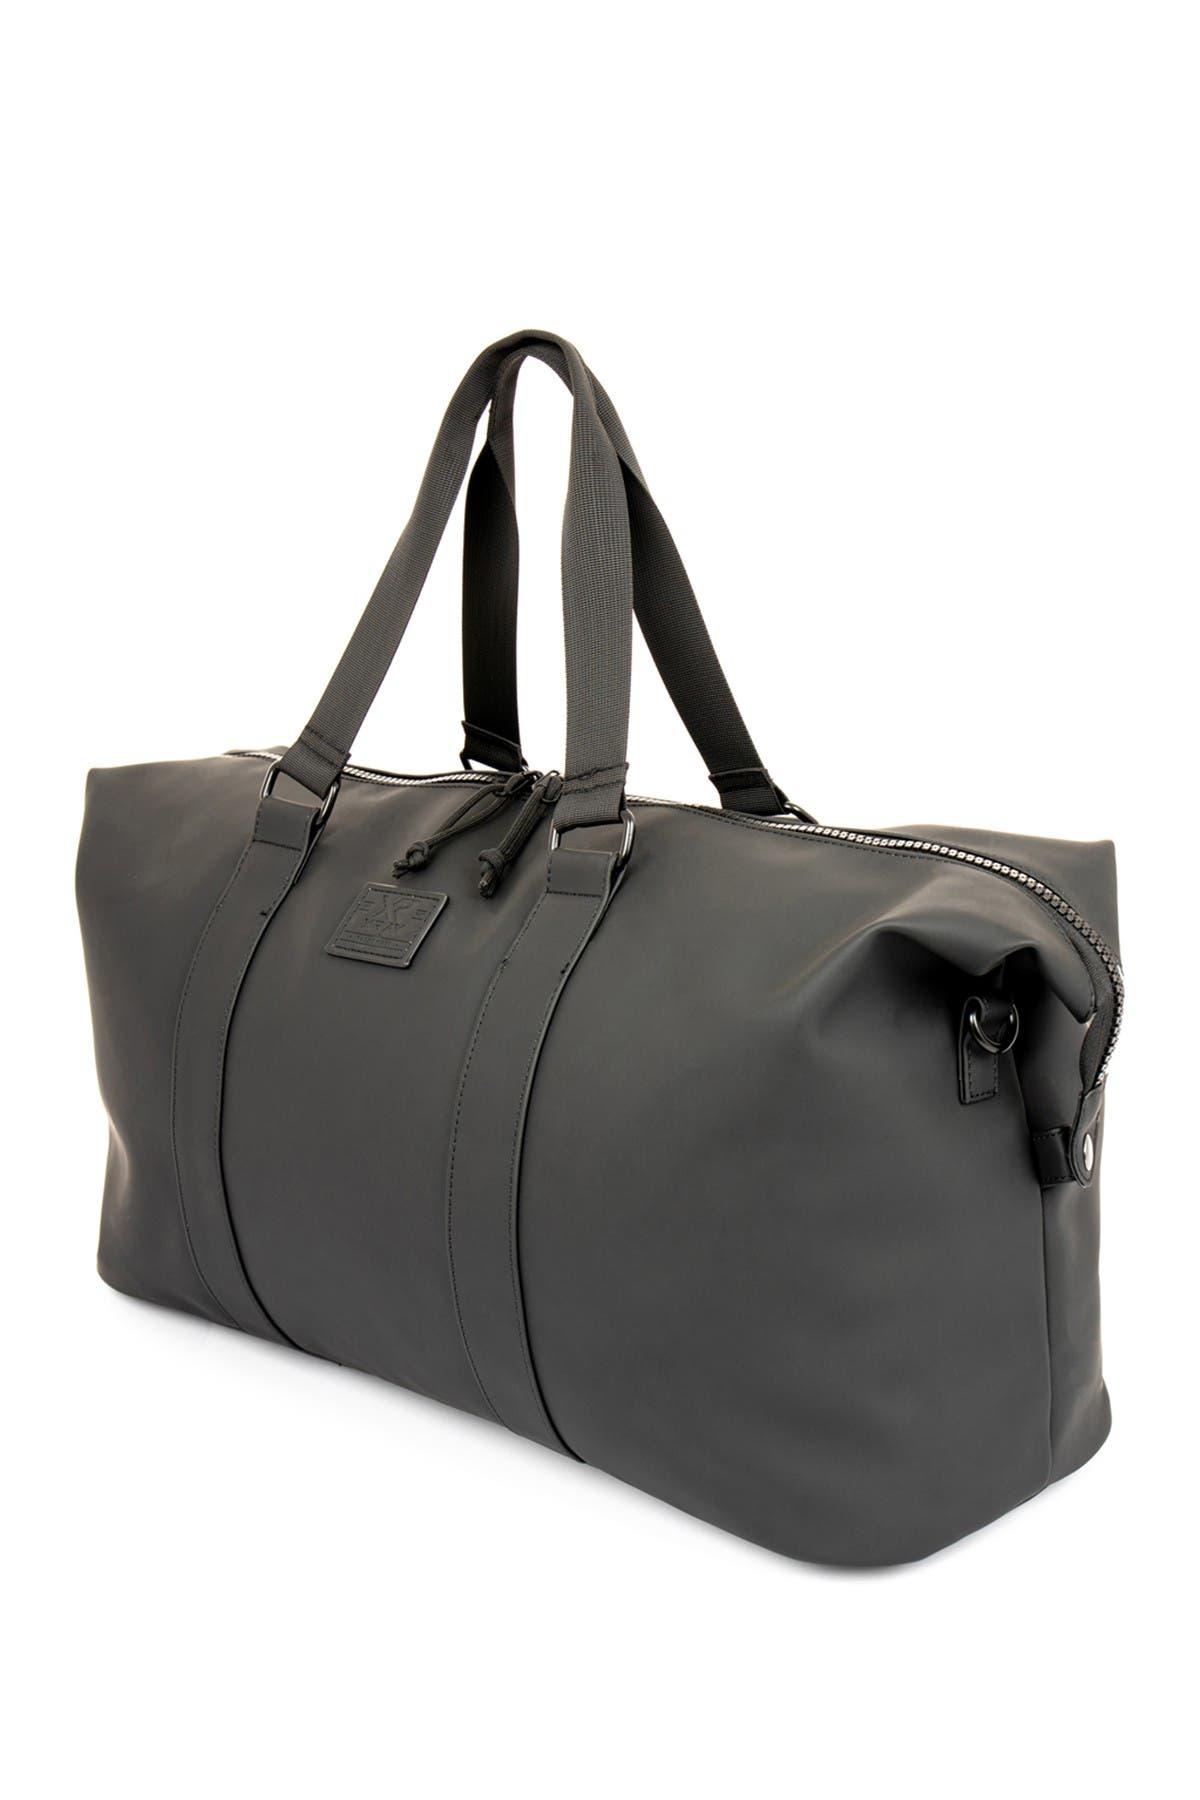 Image of XRAY Waterproof Travel Duffel Bag